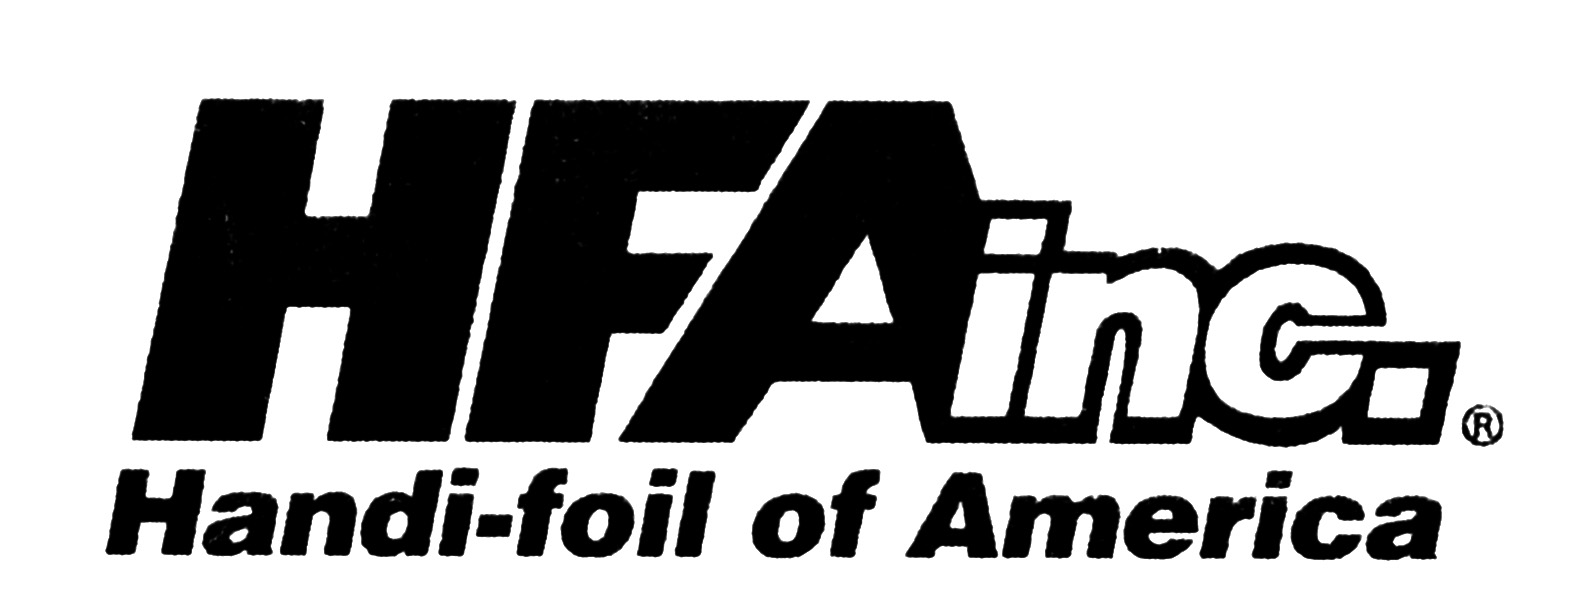 Handi-Foil of America